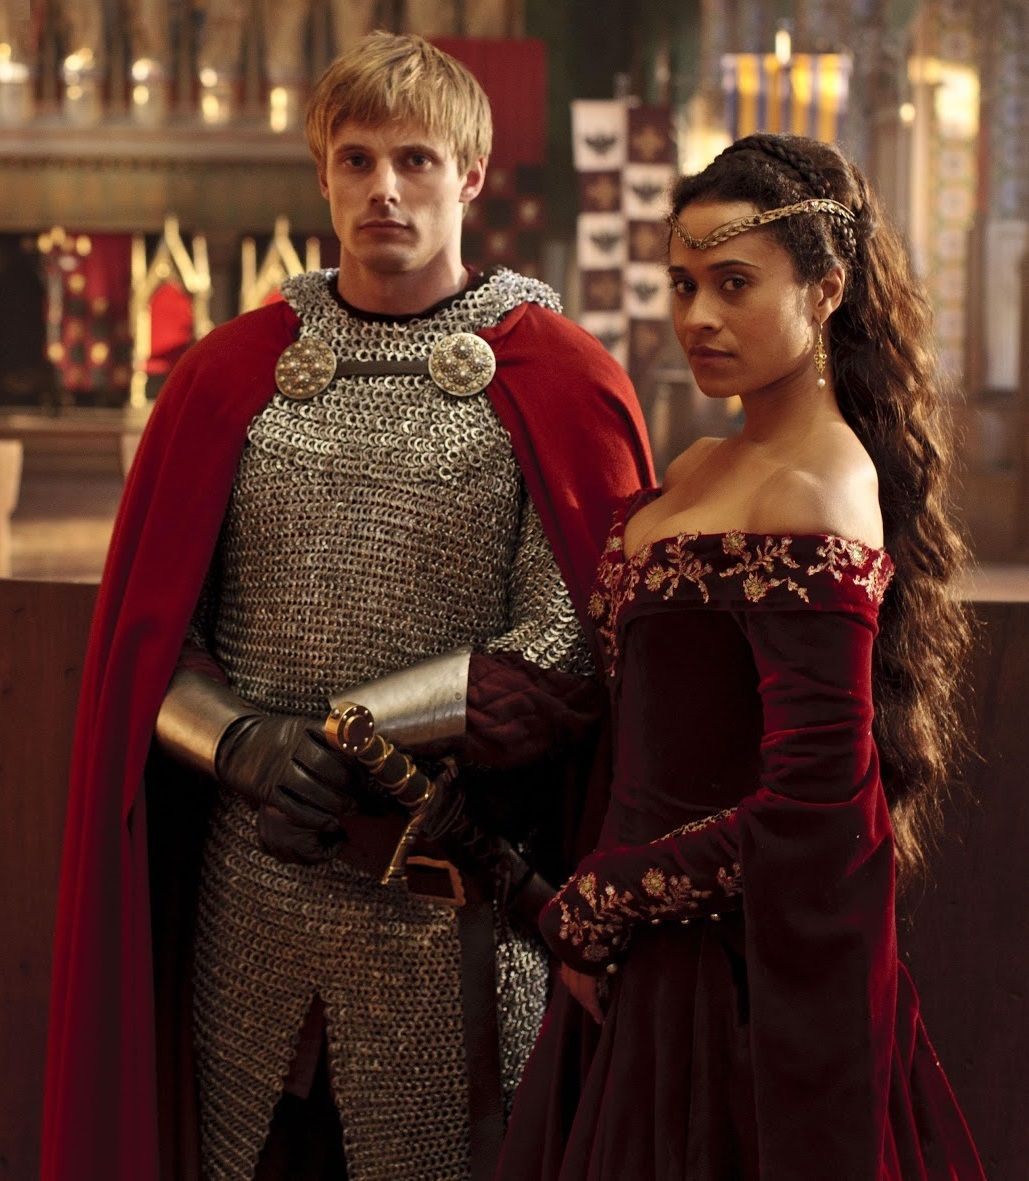 King Arthur & Queen Guinevere